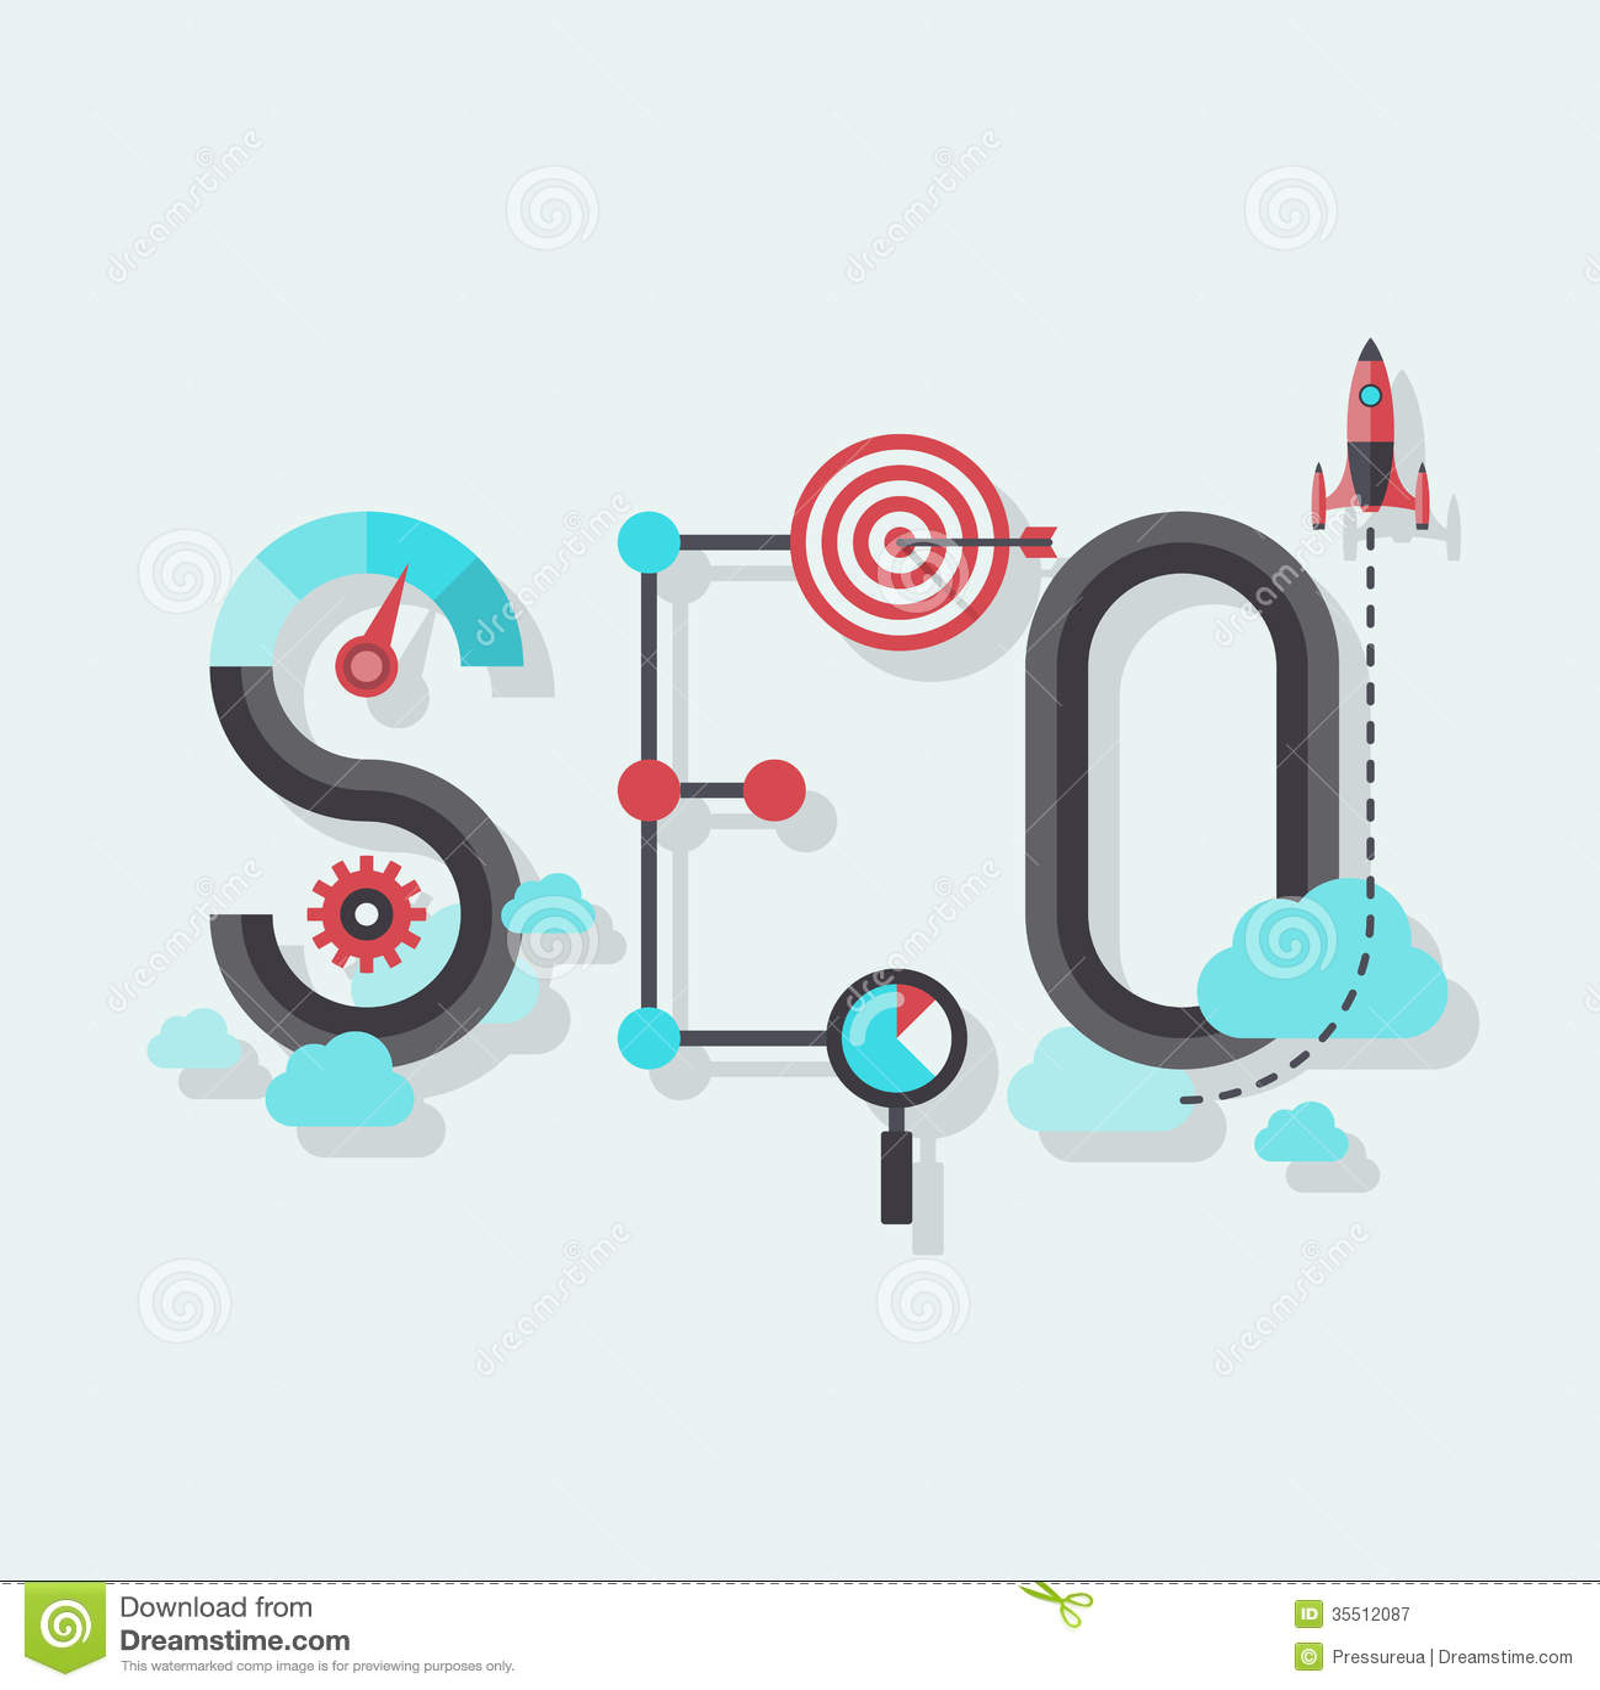 Seo Word Flat Illustration Royalty Free Stock Photography